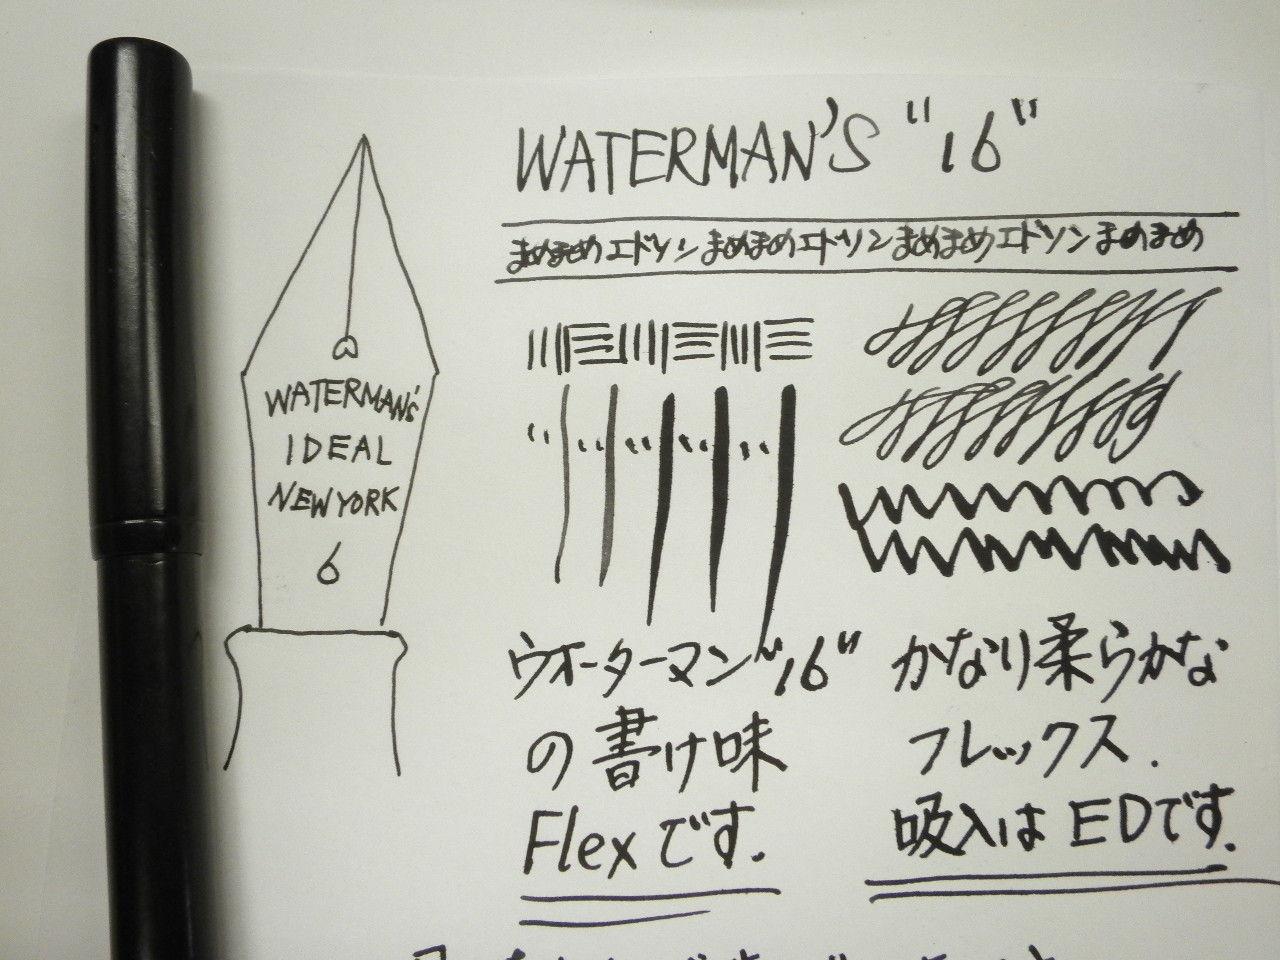 Waterman 39 s 16 ed for Waterman 16